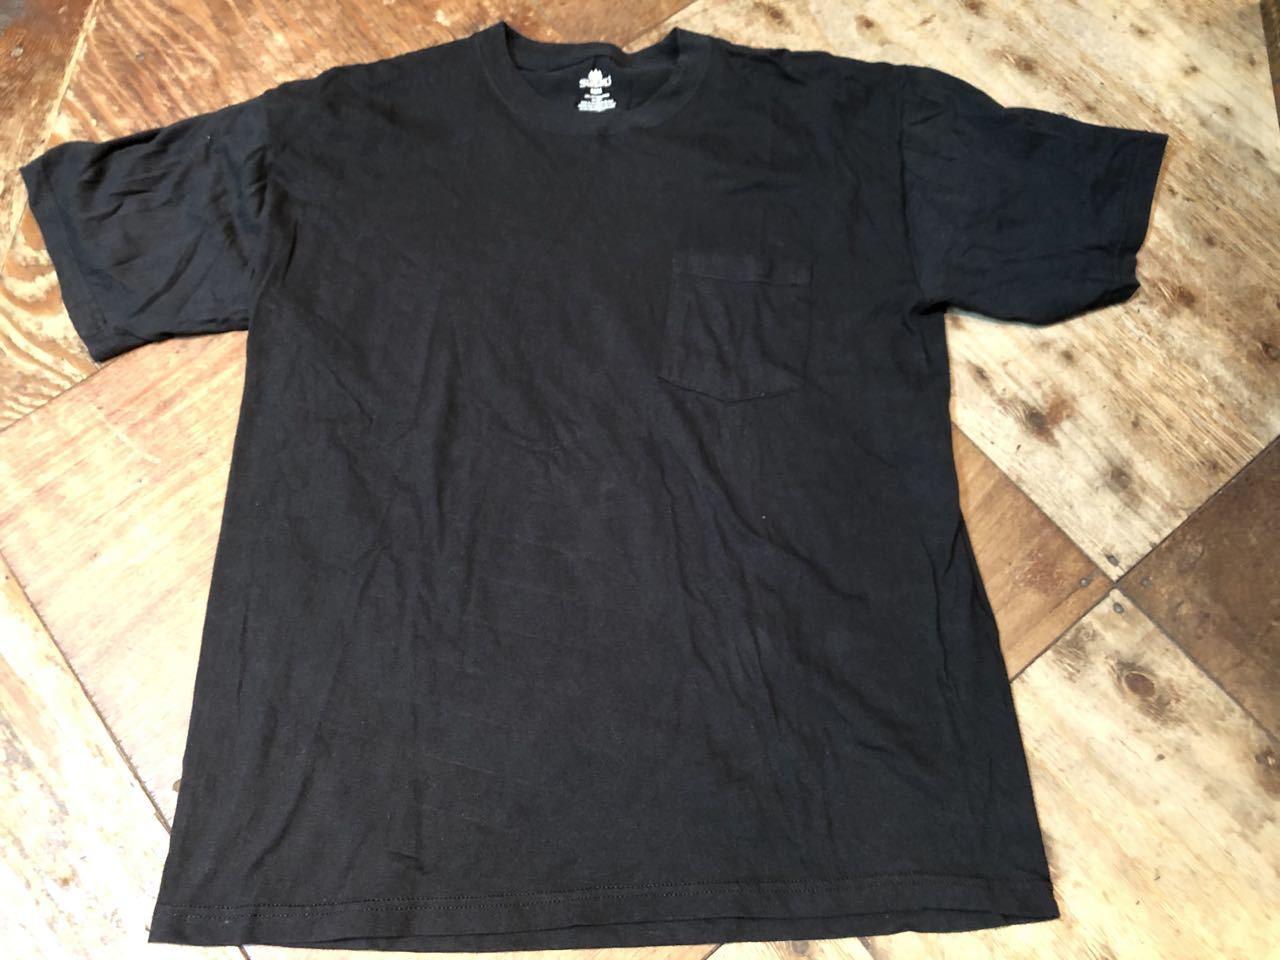 all cotton STAFFORD ブラック ポケットTシャツ!_c0144020_13034386.jpg